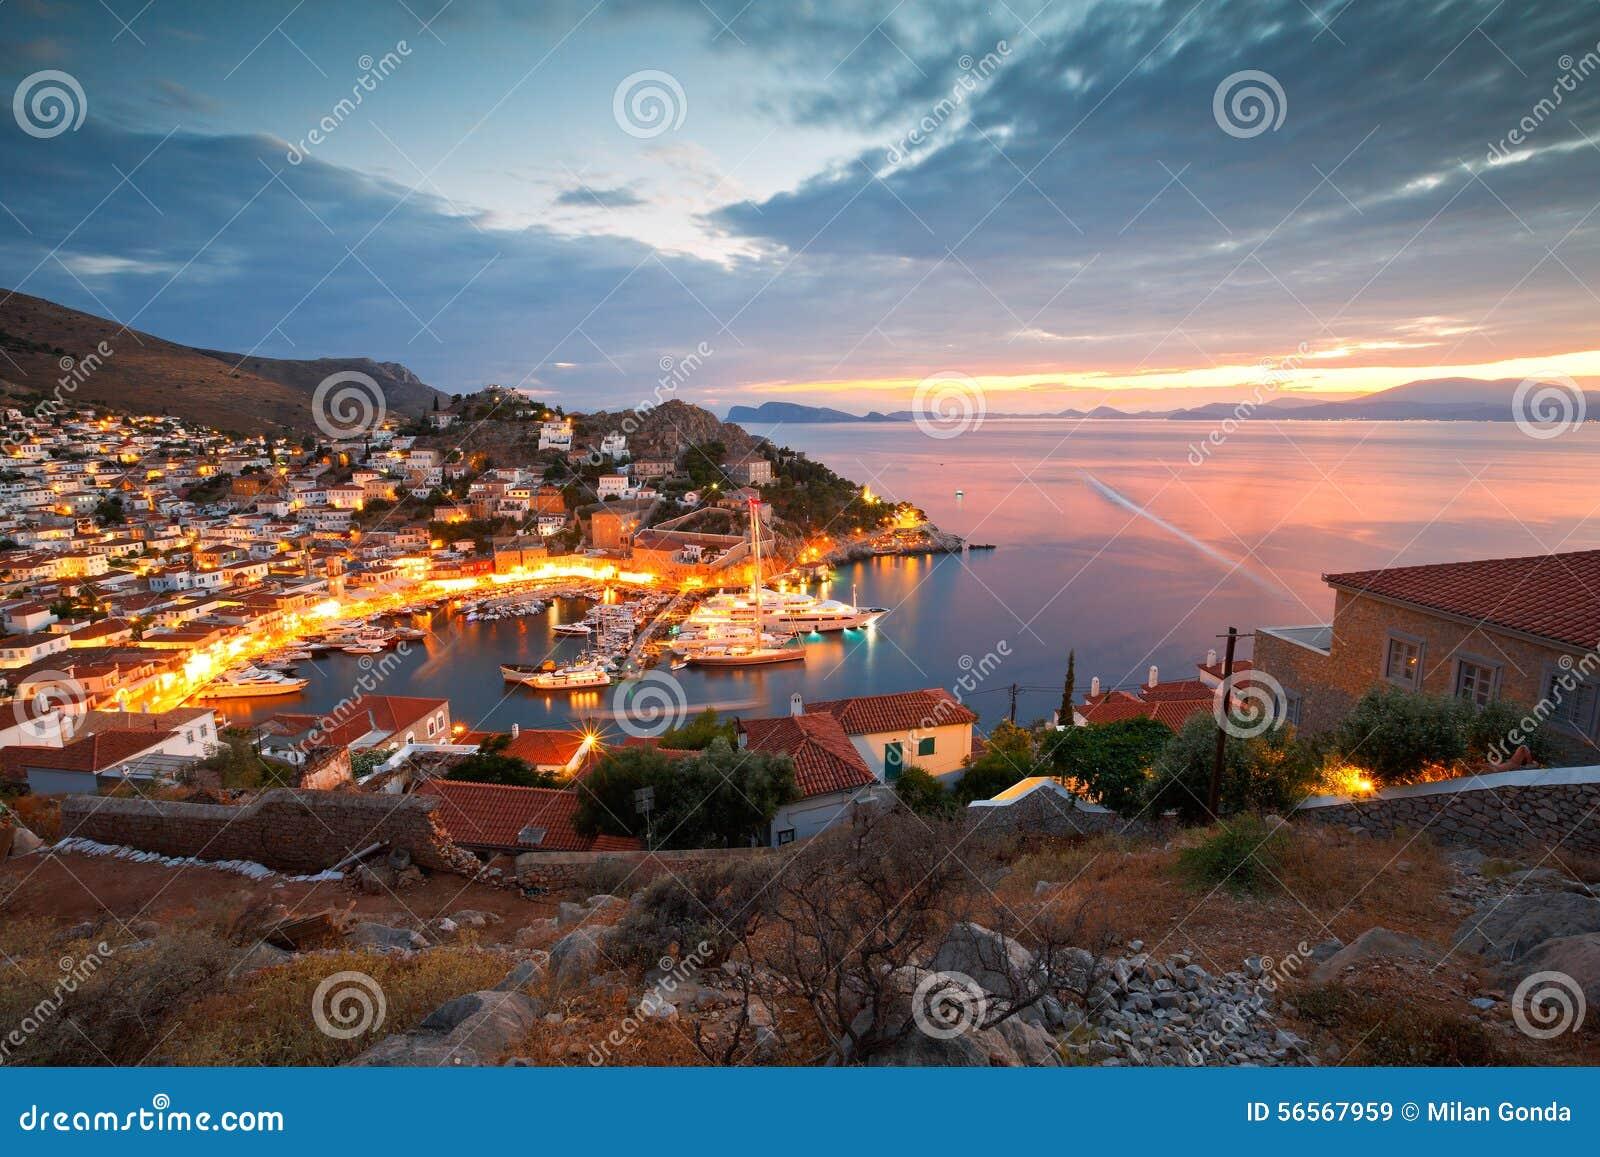 Download Νησί Hydra εκδοτική στοκ εικόνα. εικόνα από πελοπόννησος - 56567959